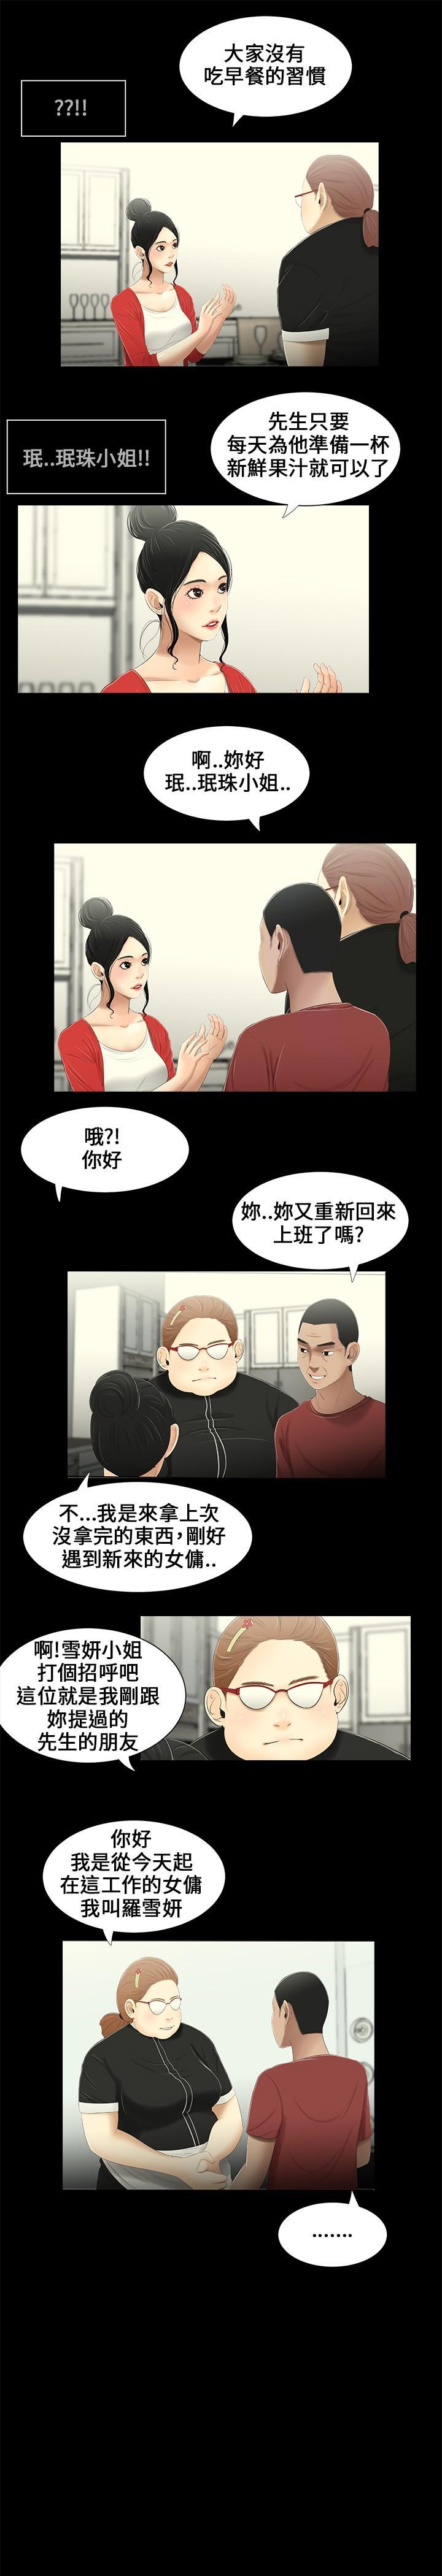 Three sisters 三姐妹Ch.13~19 (Chinese)中文 22